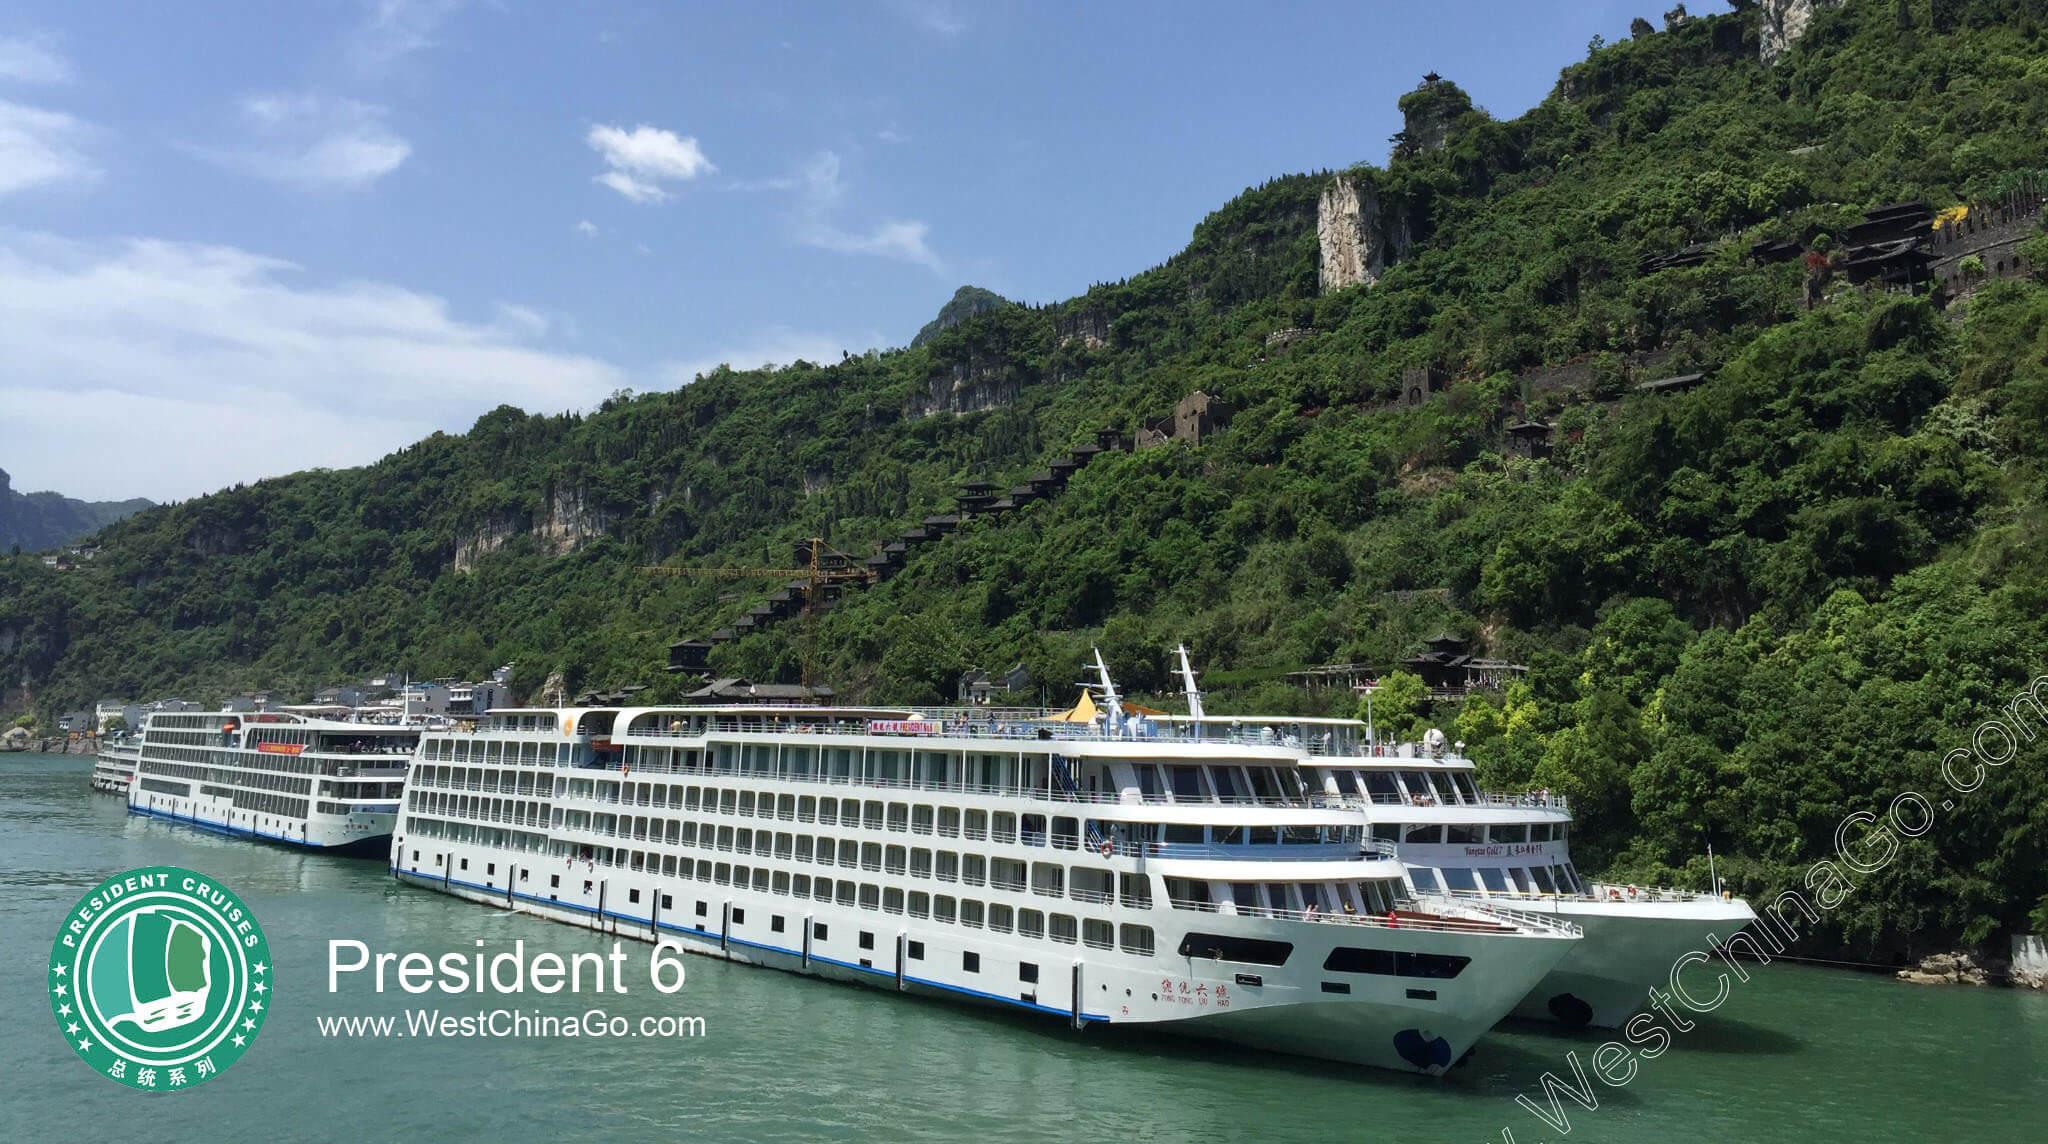 Yangtze River Cruise President 6